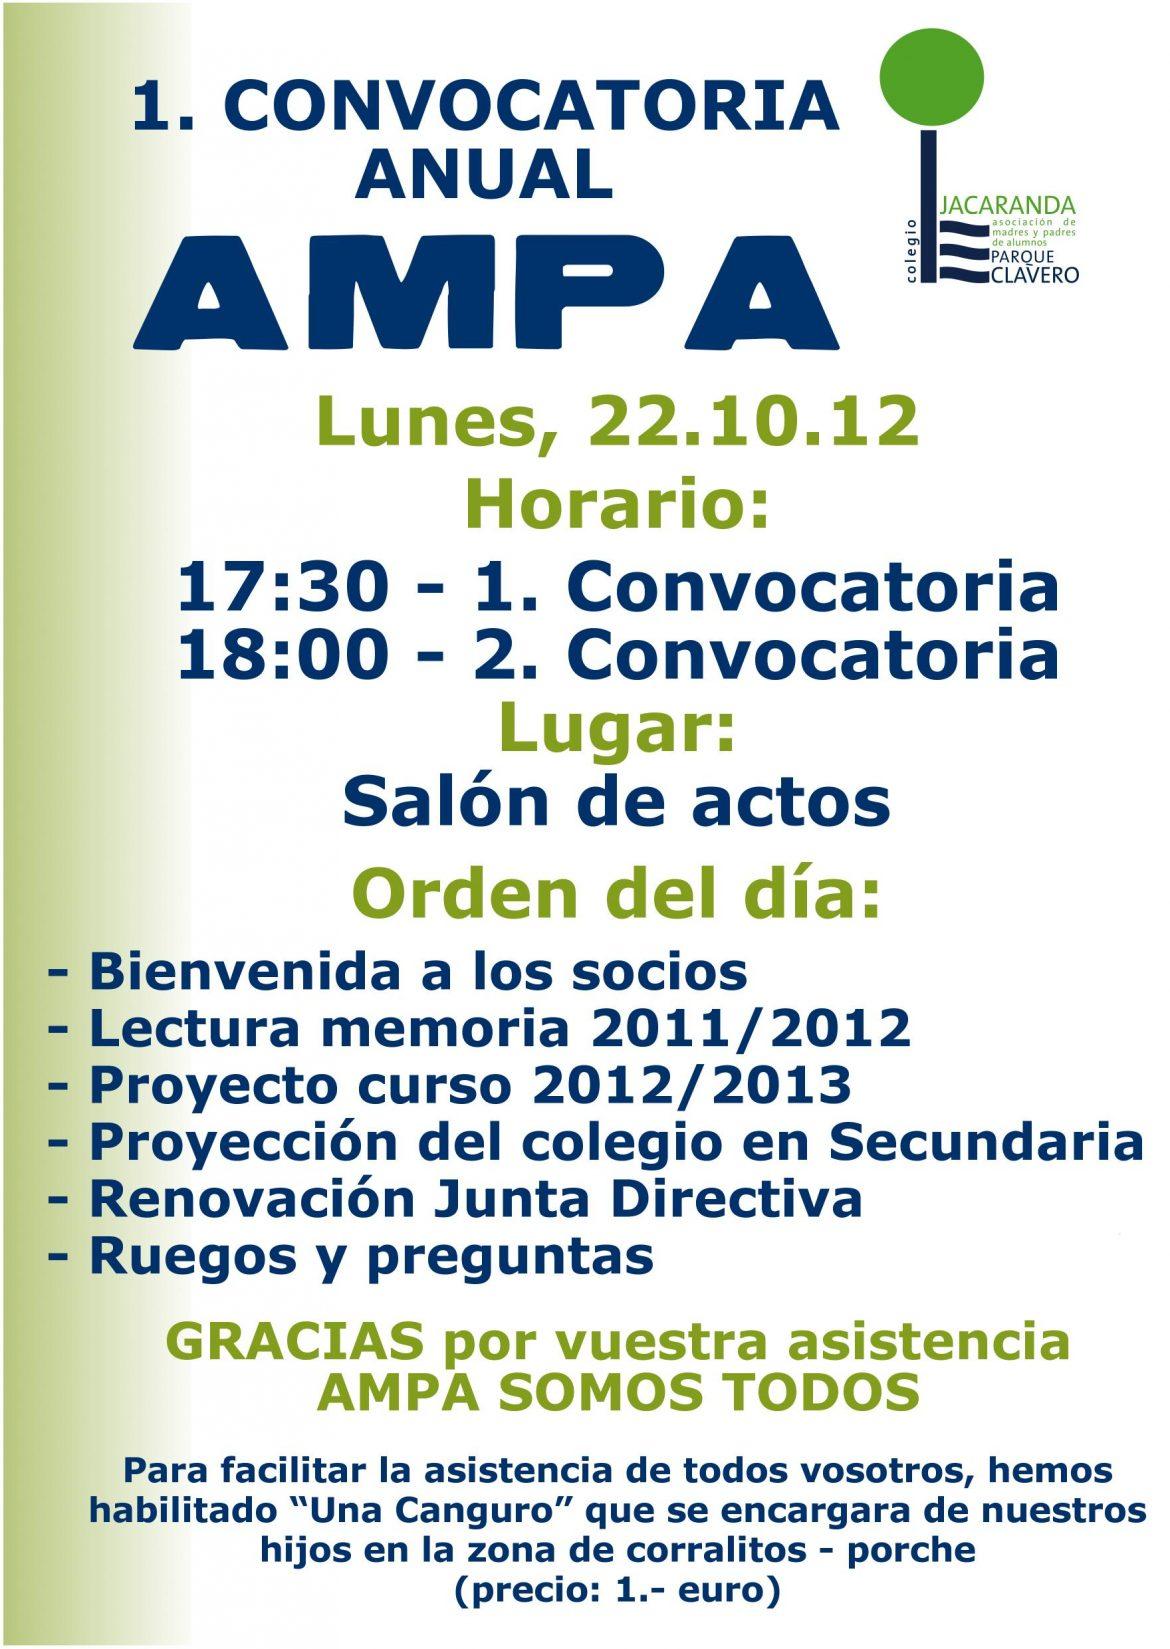 Convocatoria anual AMPA Jacaranda